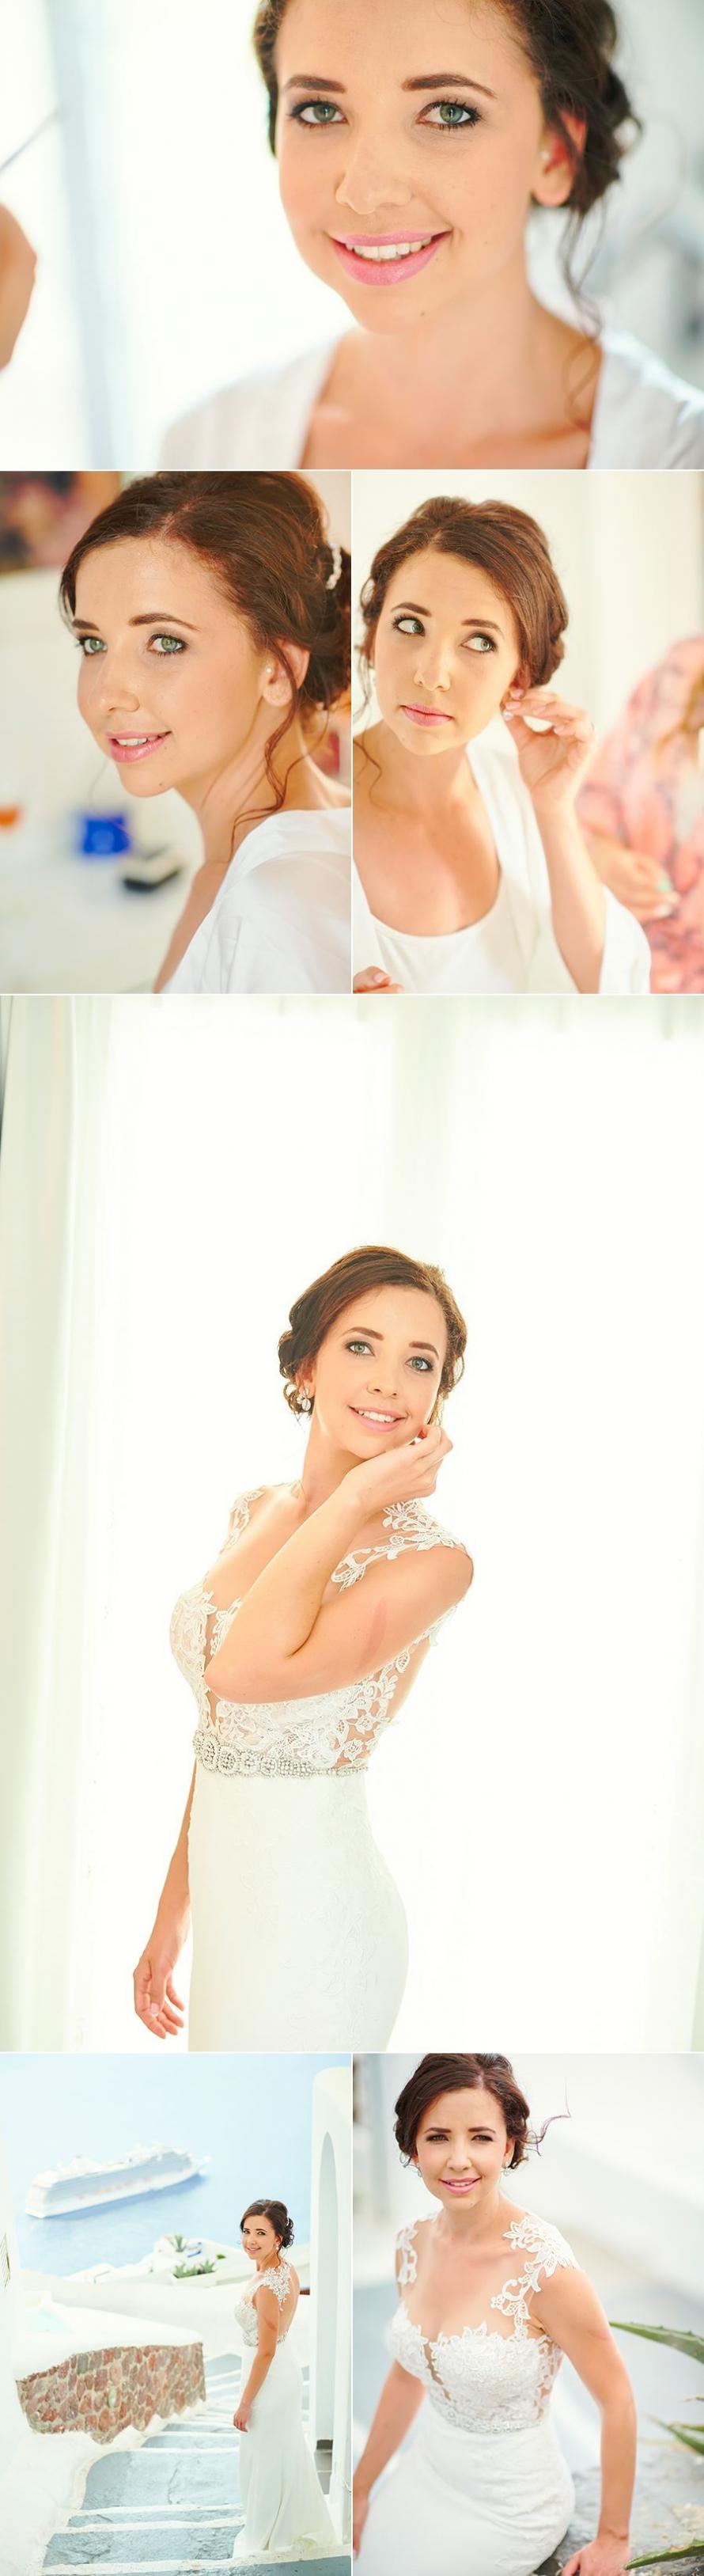 paul-simone-wedding-photos-02